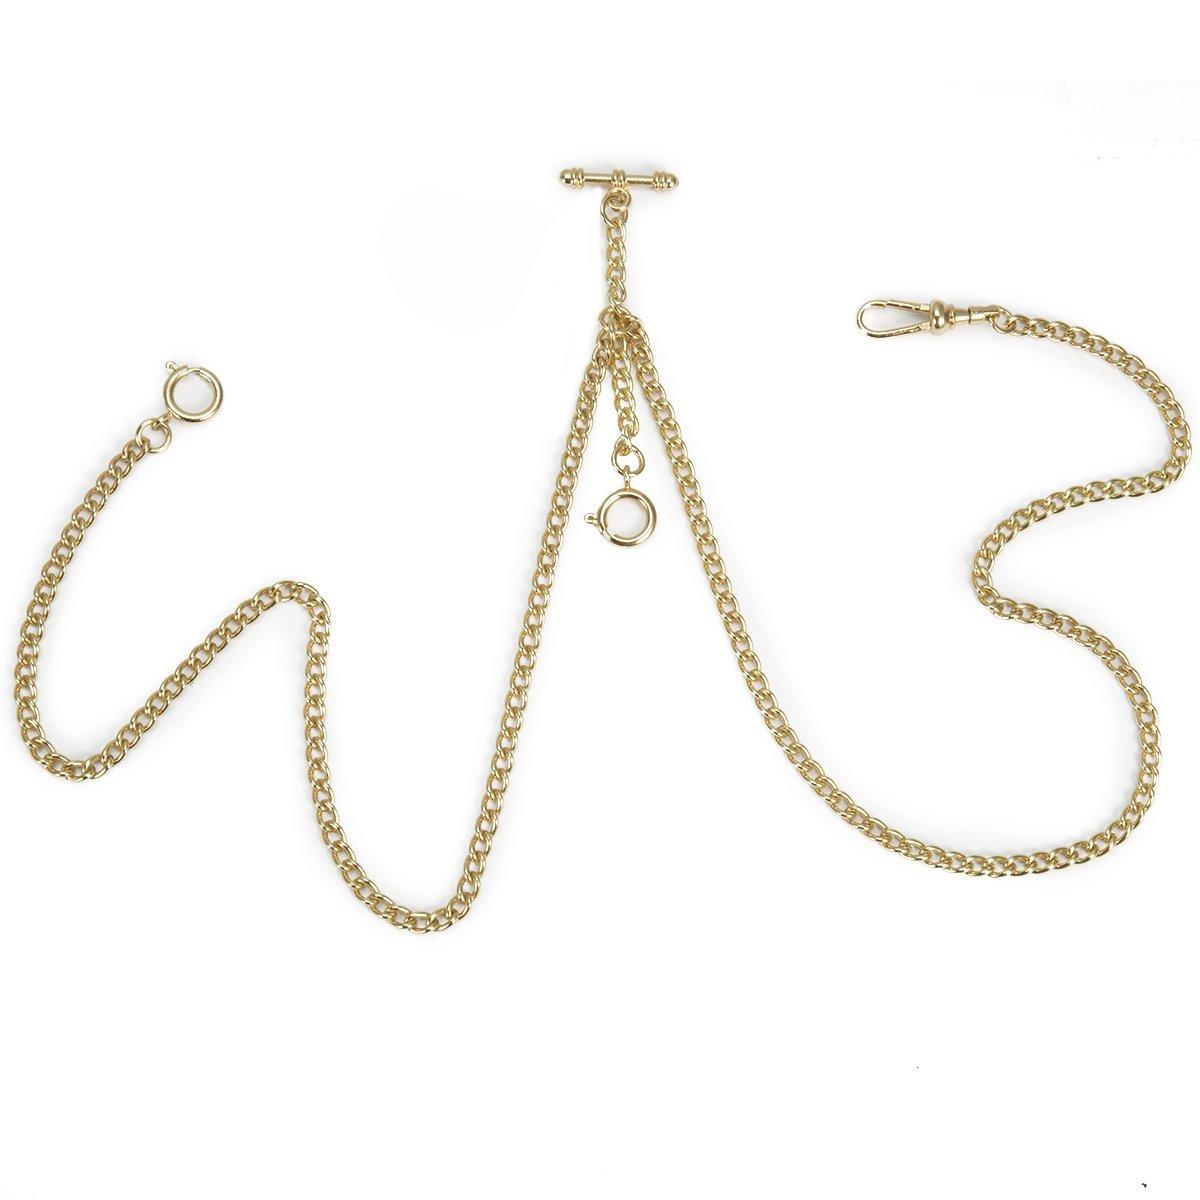 ManChDa Pocket Watch Double Albert Chain T-Bar Watch Chain Link 16 inch 3 hook Champagne Golden Gorgeous